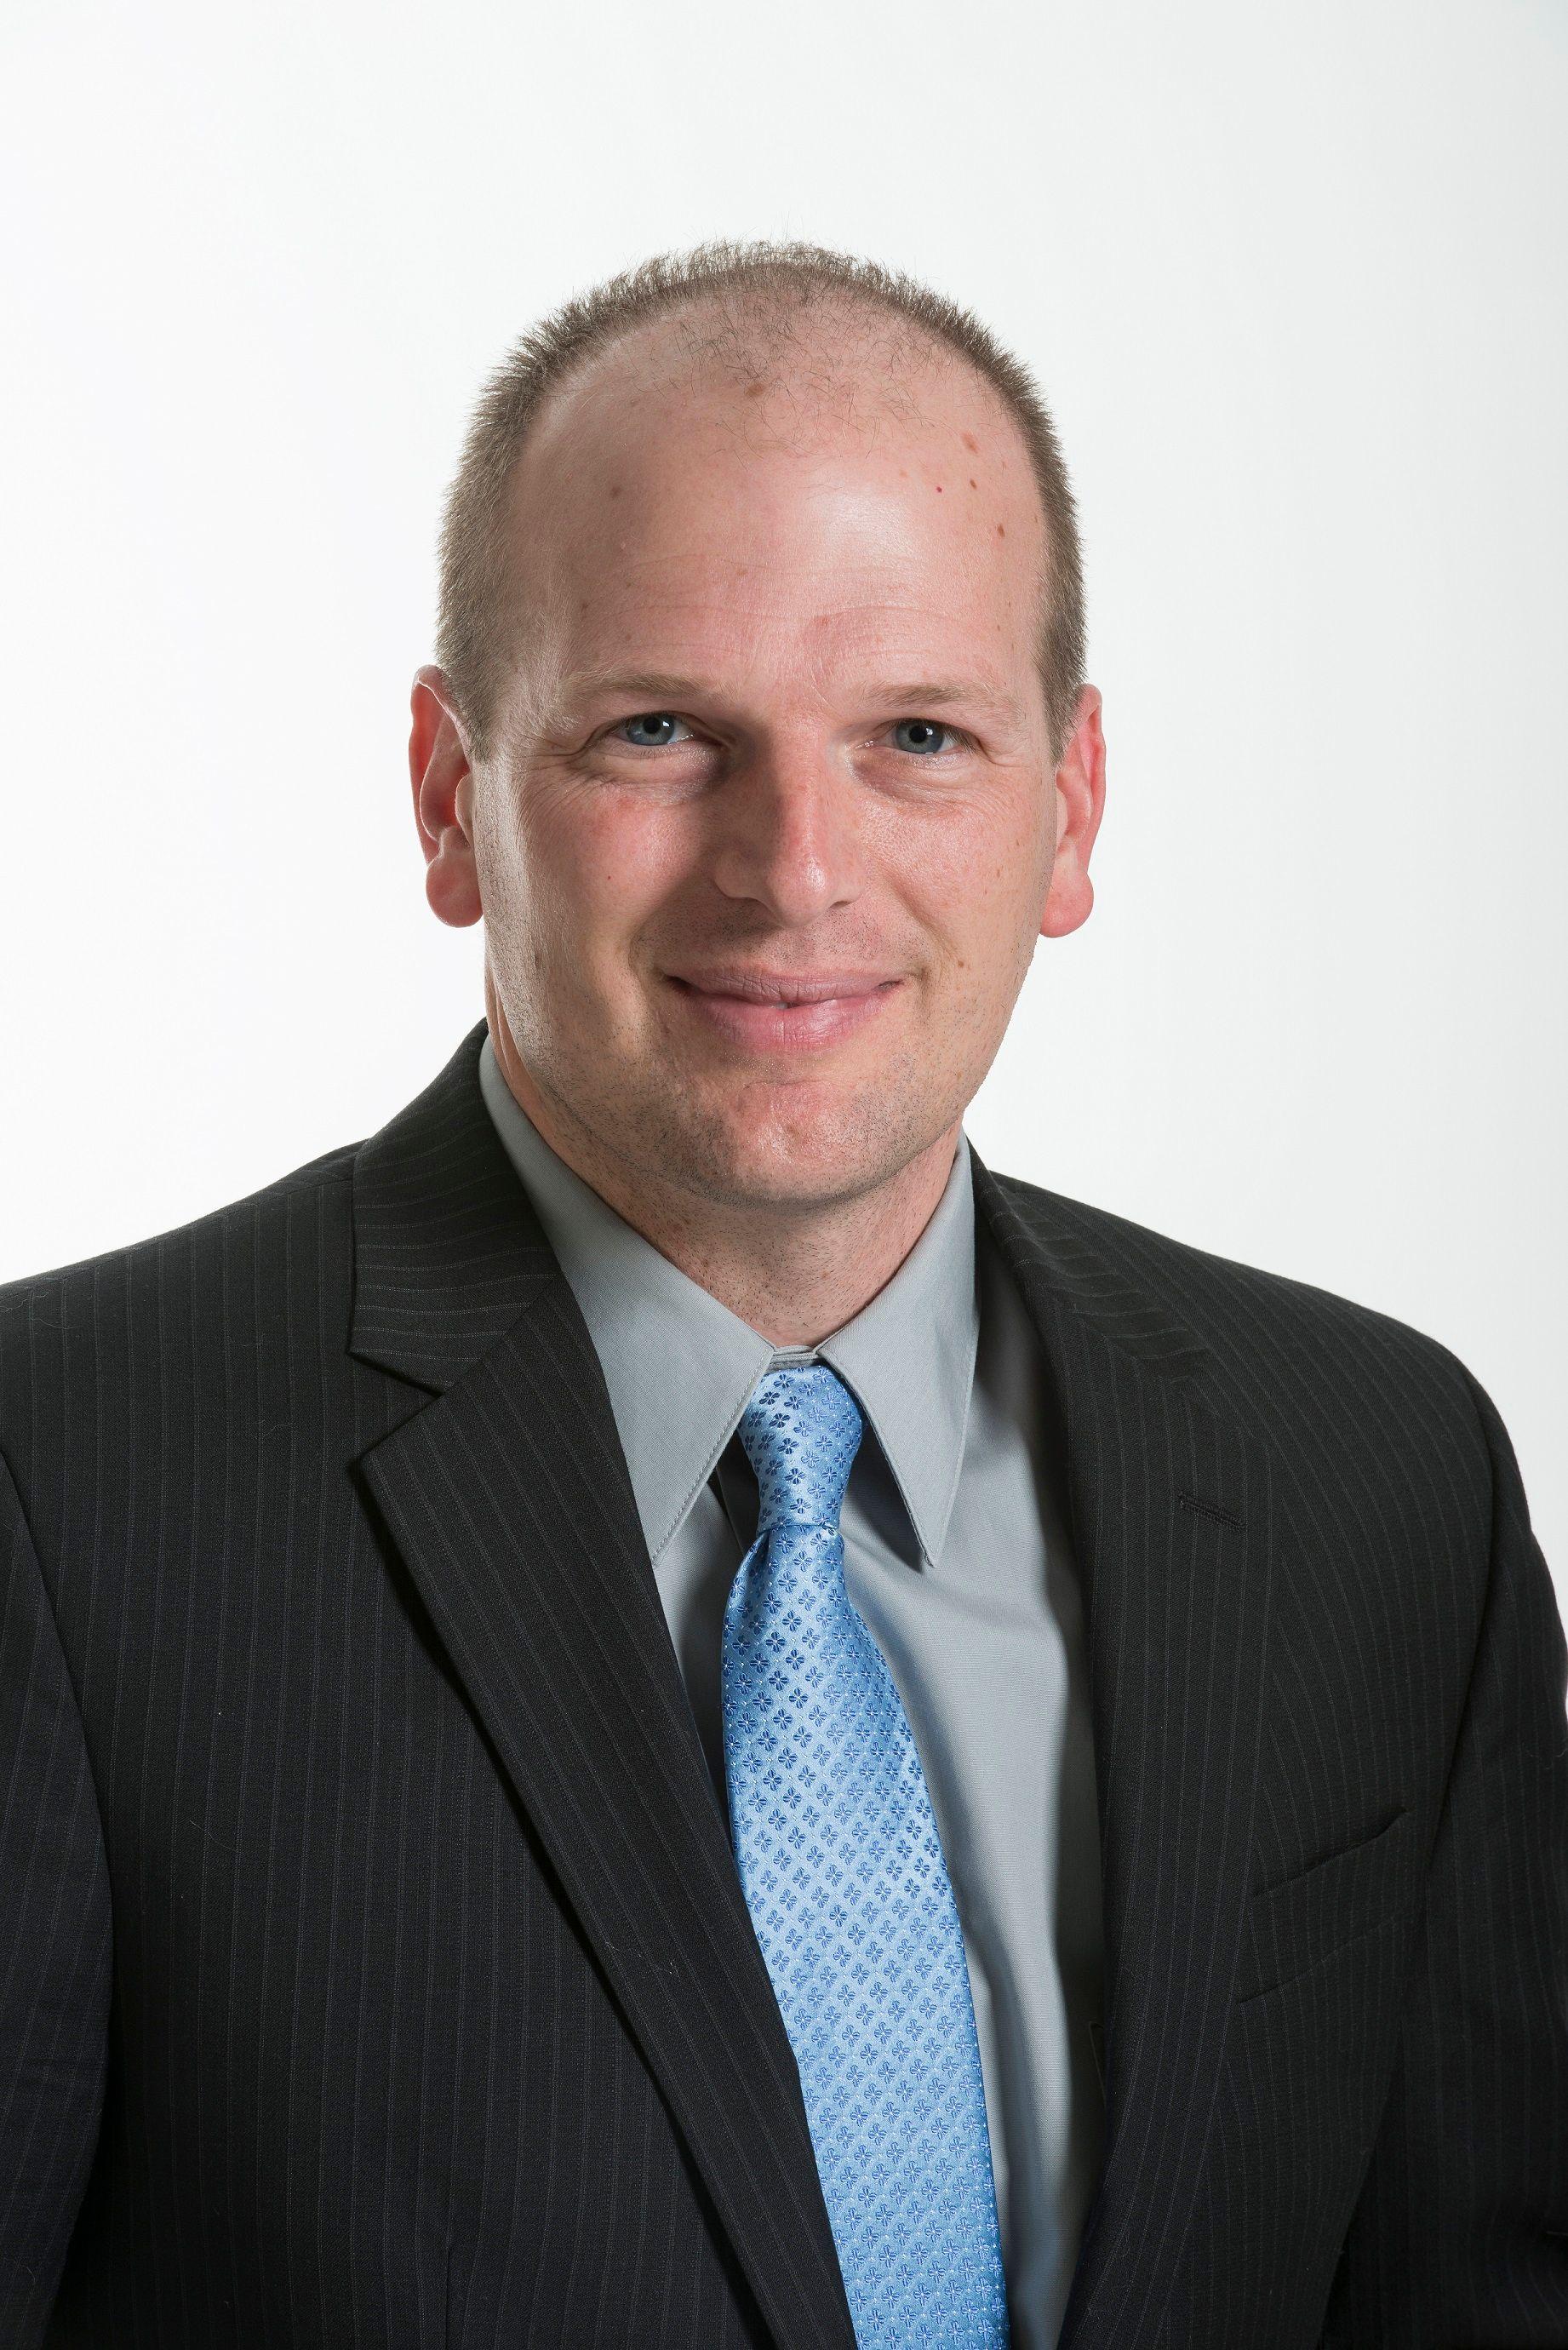 David Rasmussen, Secretary